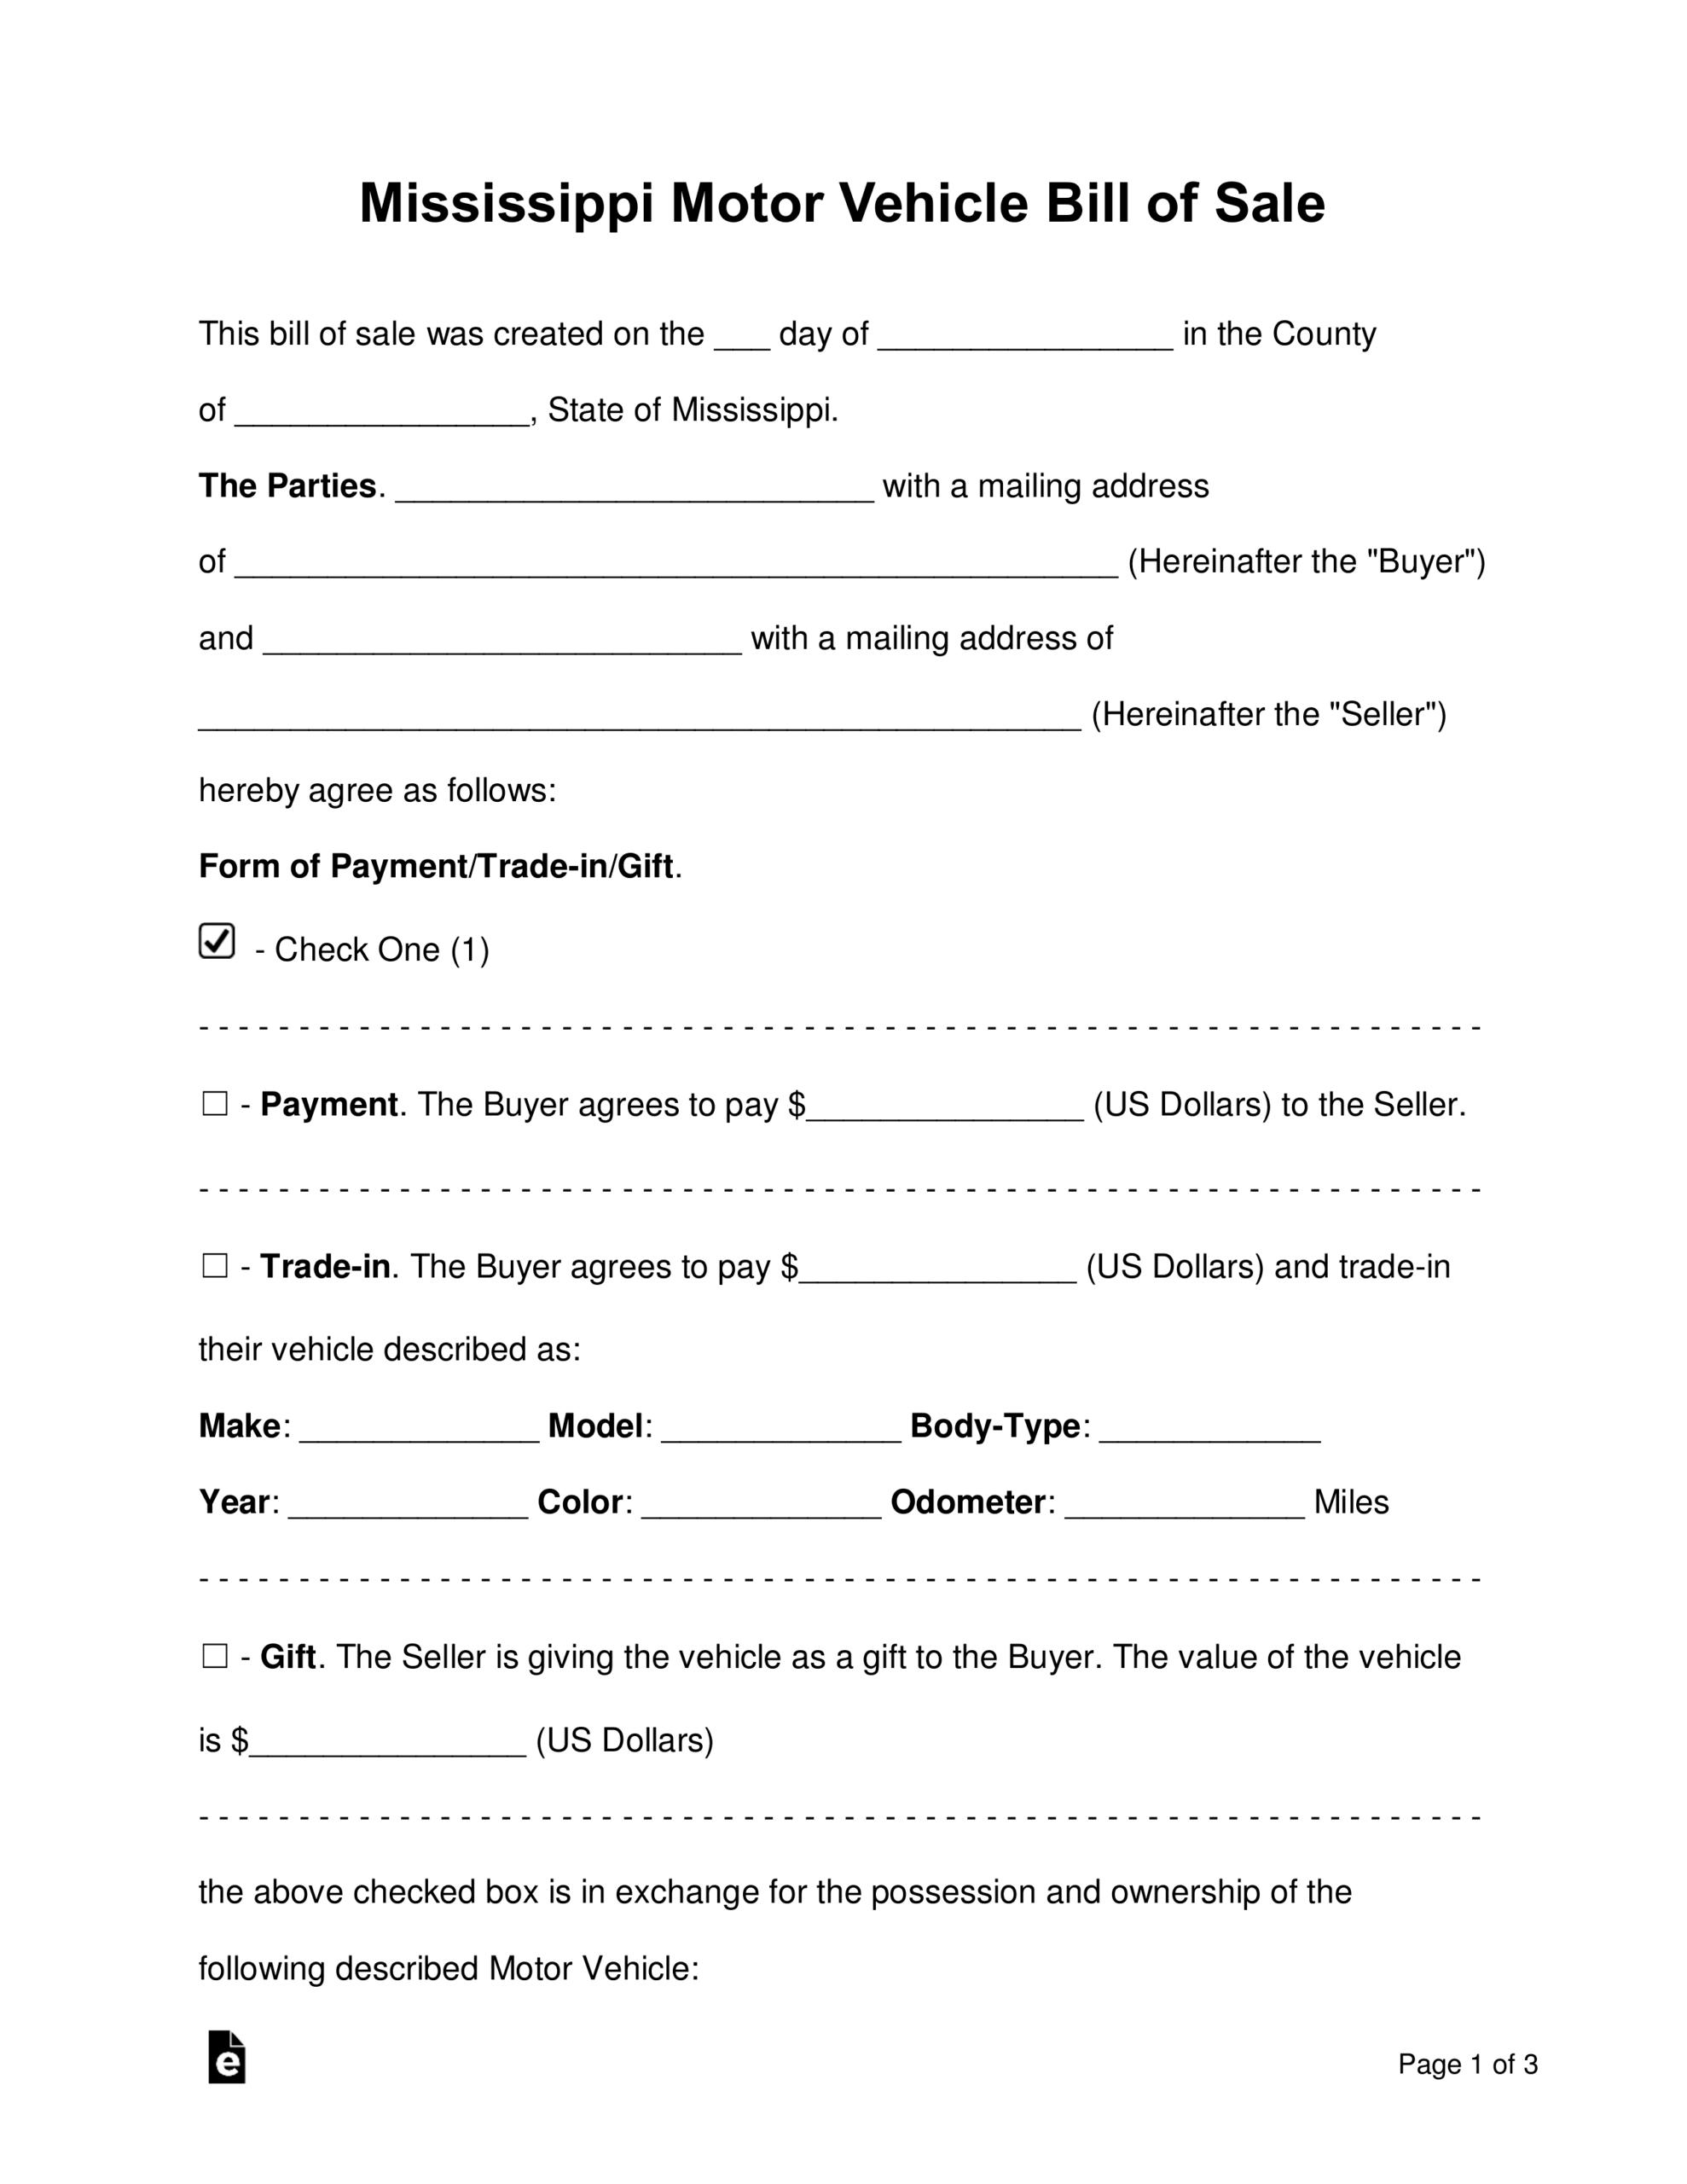 Microsoft Bill Of Sale Templates - Tunu.redmini.co Inside Car Bill Of Sale Word Template